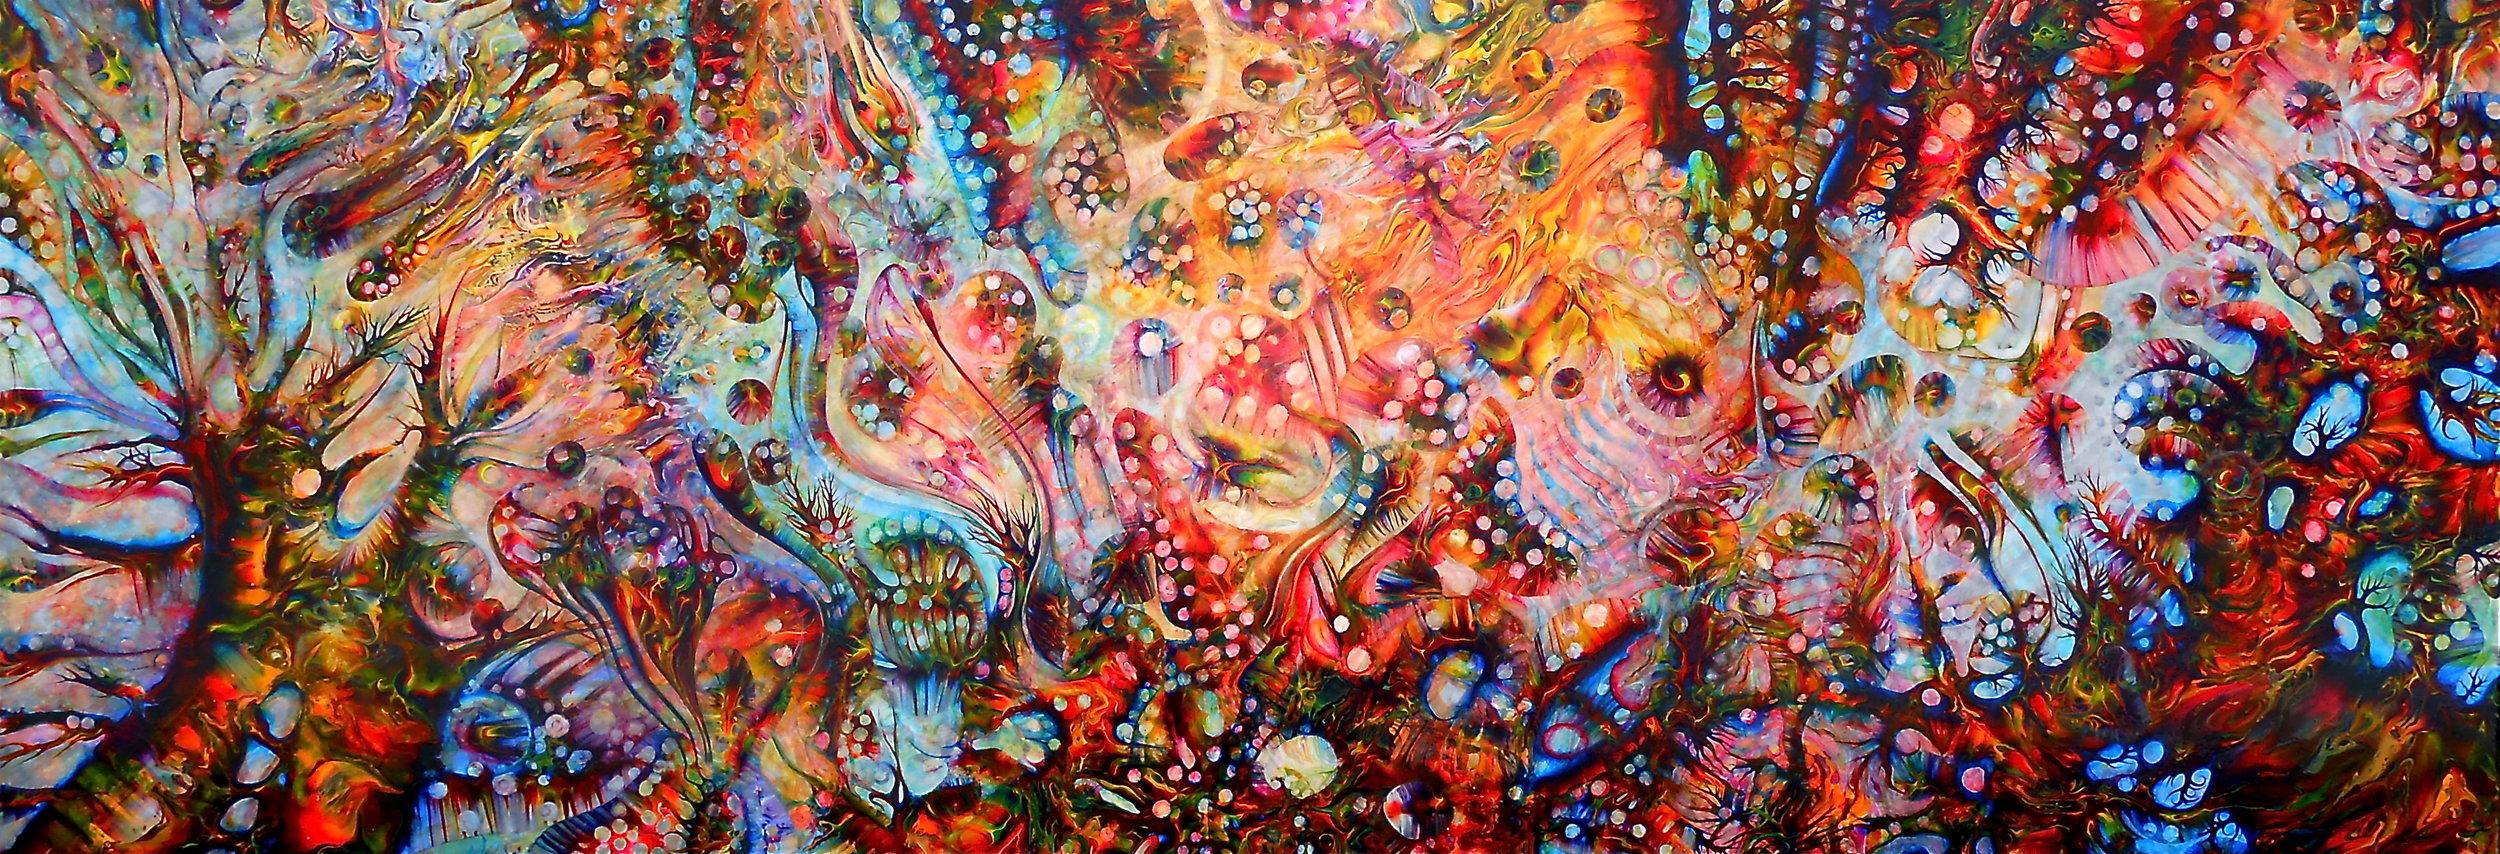 """Heart of the Psychedelic Jungle"" 32cm x 91cm, acrylic – Kristen E Carleton"